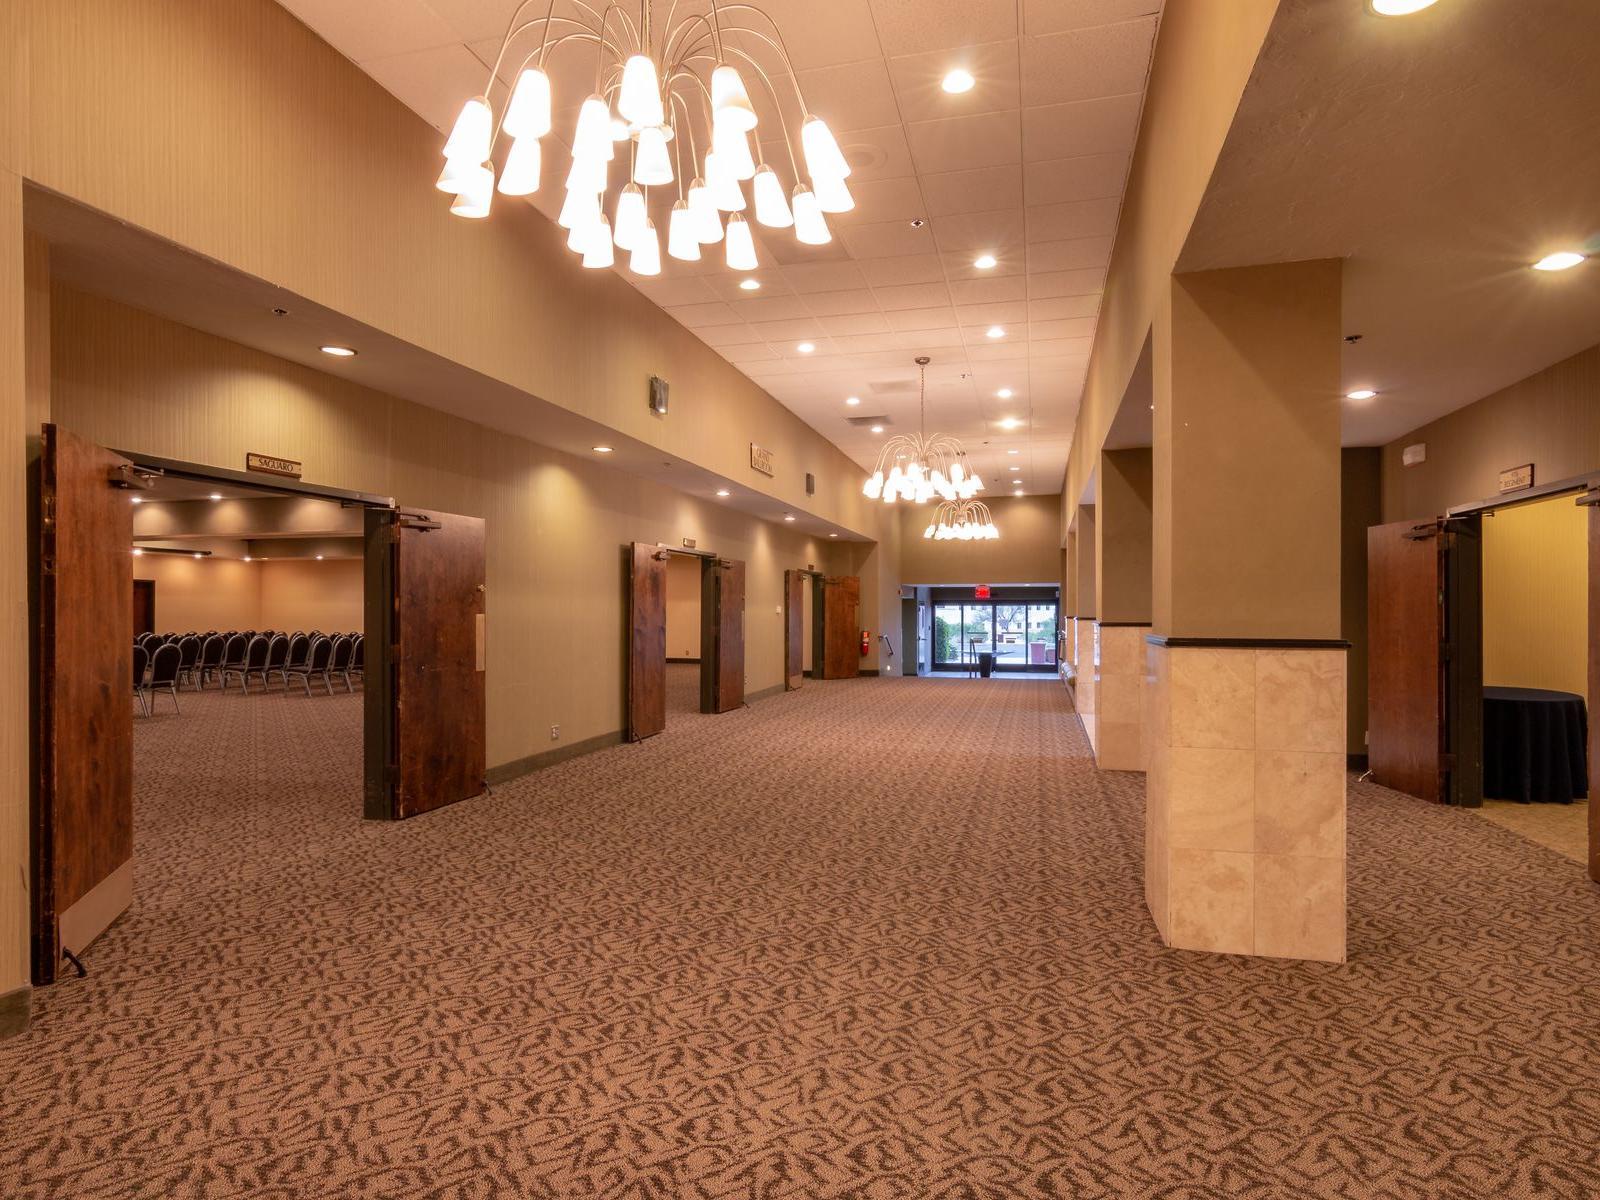 Ballroom foyer and exhibit space.